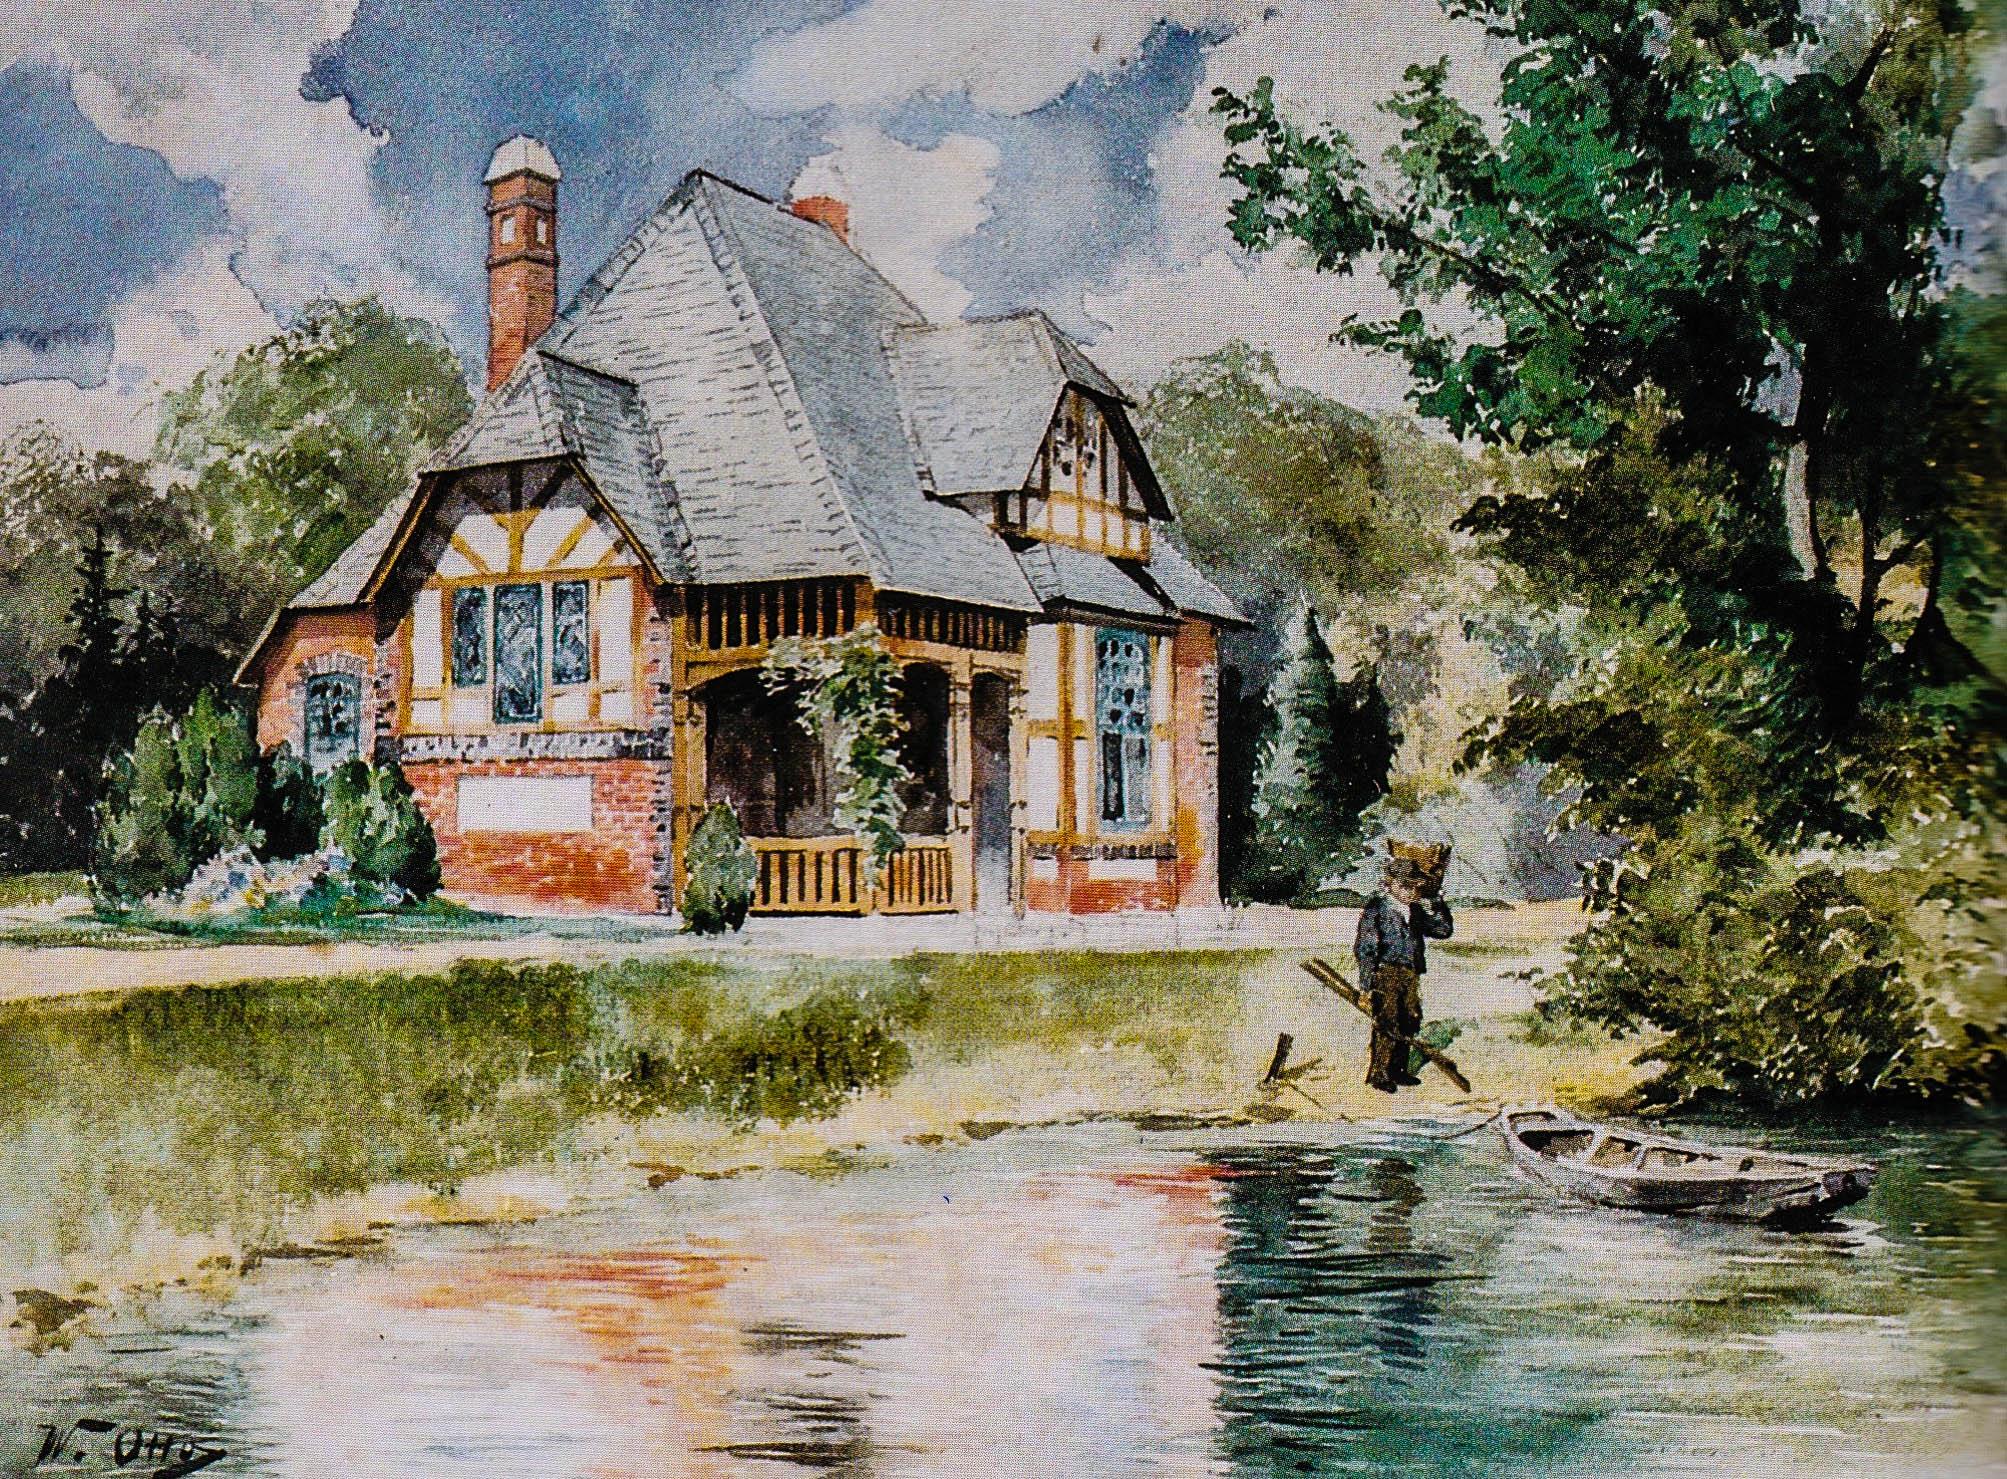 Wätjenhaus, Aquarell von Wilhelm Otto 1894